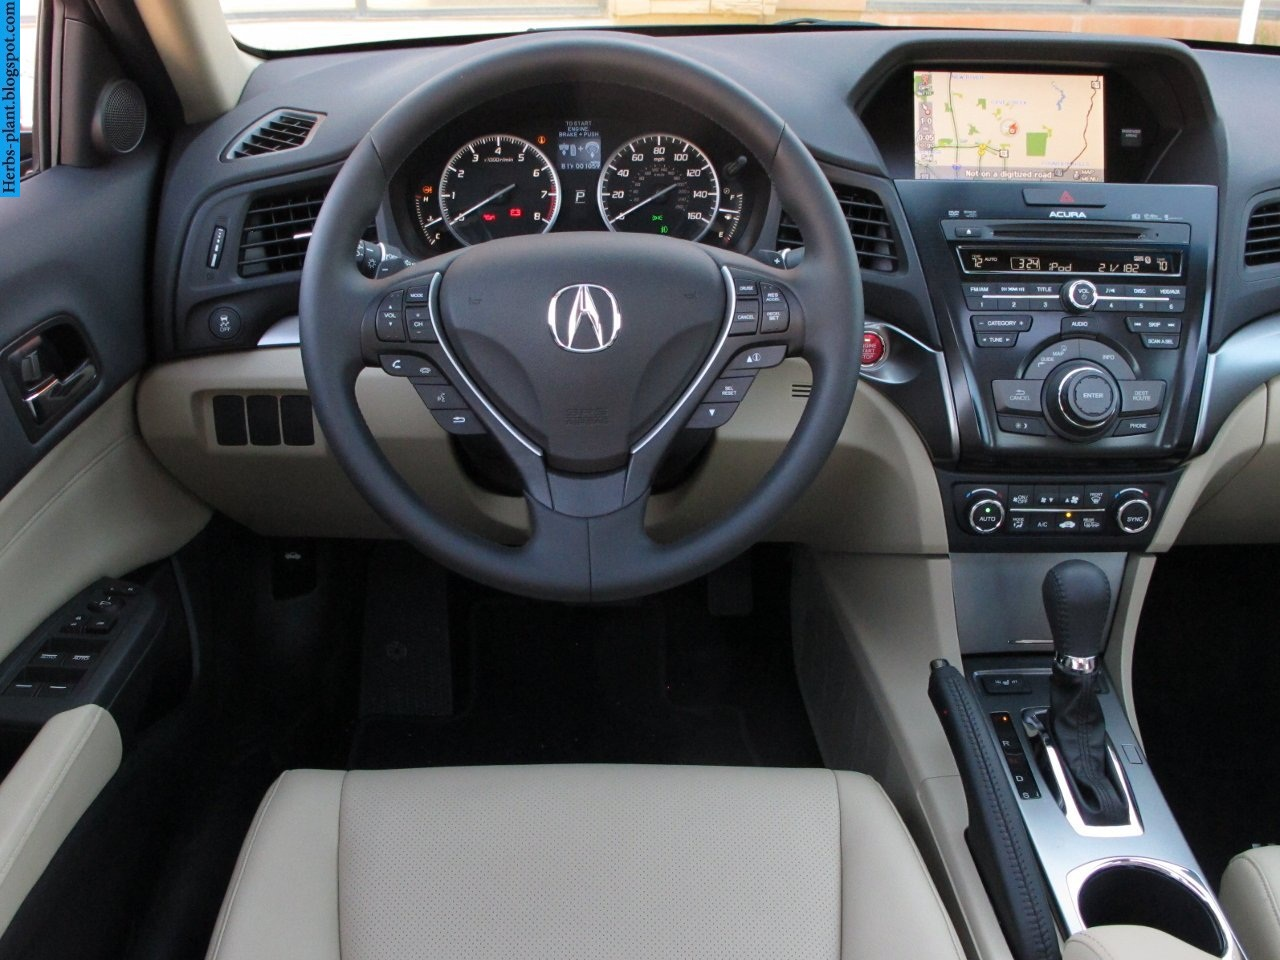 Acura rsx car 2013 interior - صور سيارة اكورا ار اس اكس 2013 من الداخل